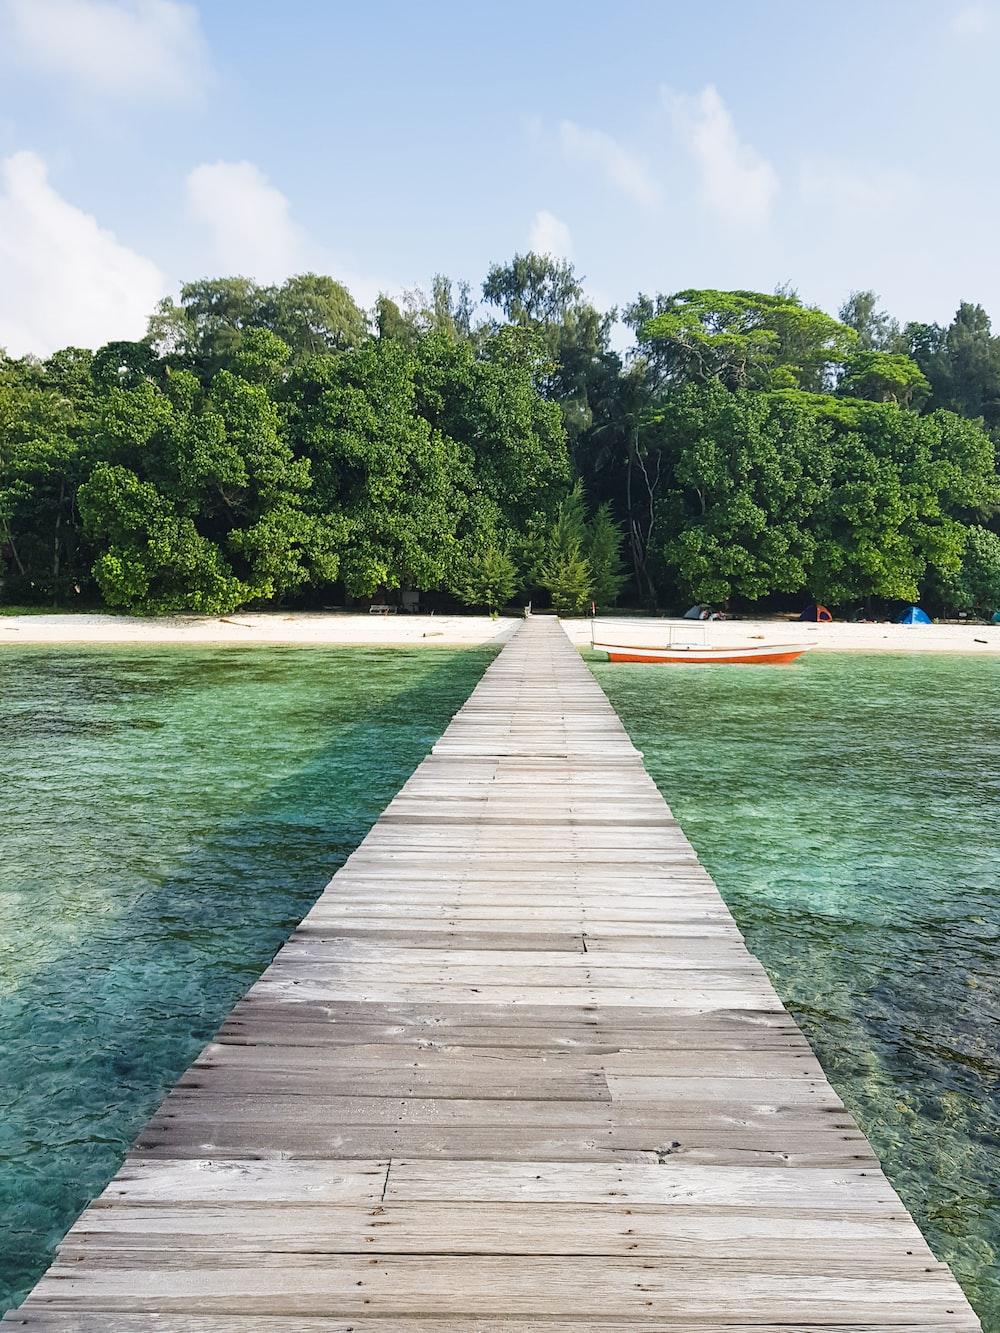 brown wooden dock on island